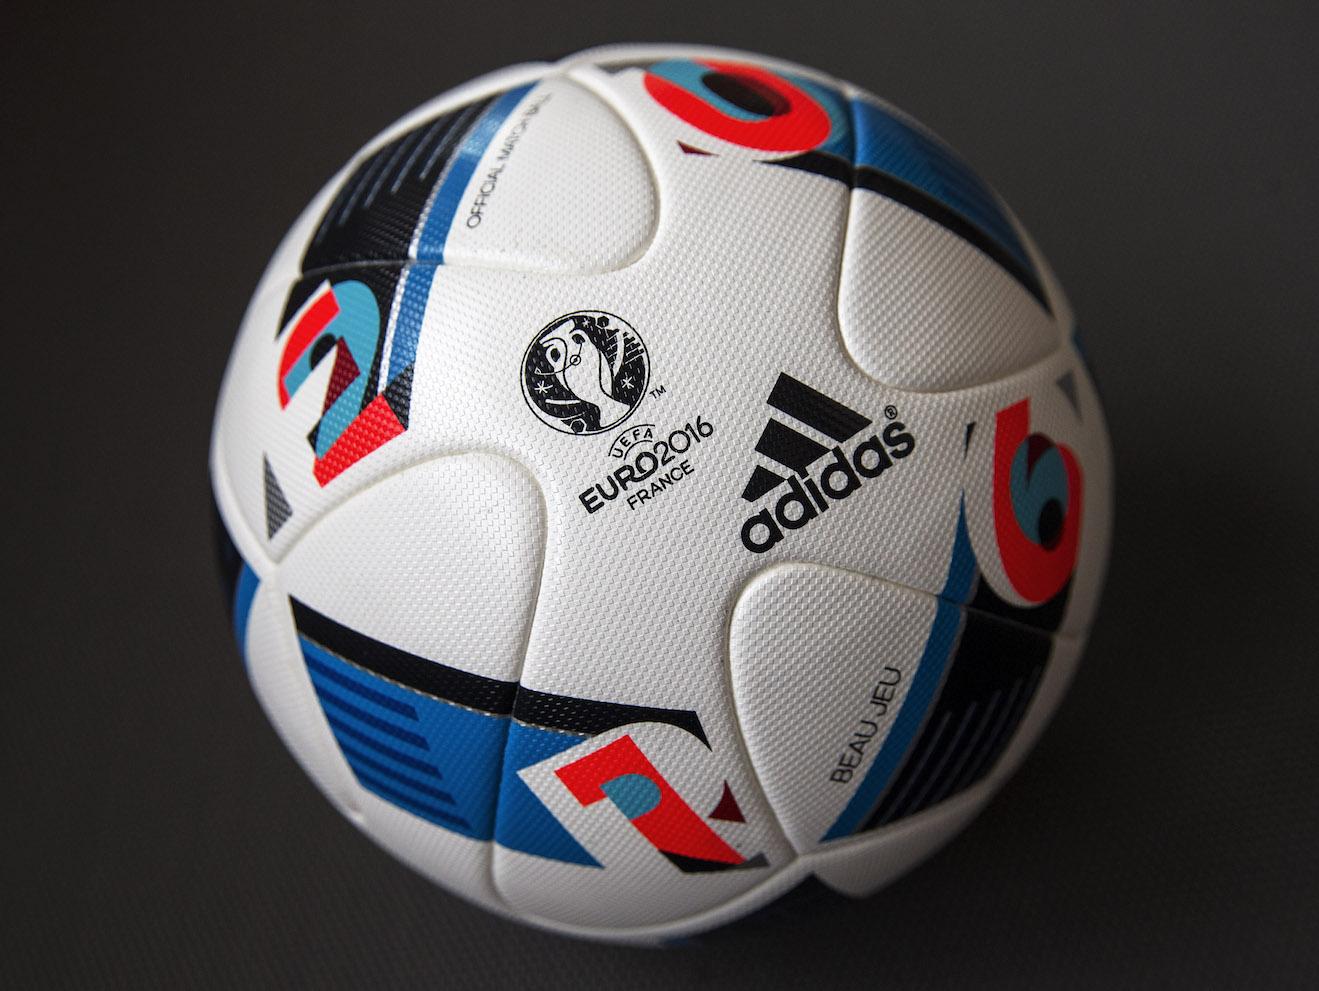 adidas-euro-2016-ball.jpg